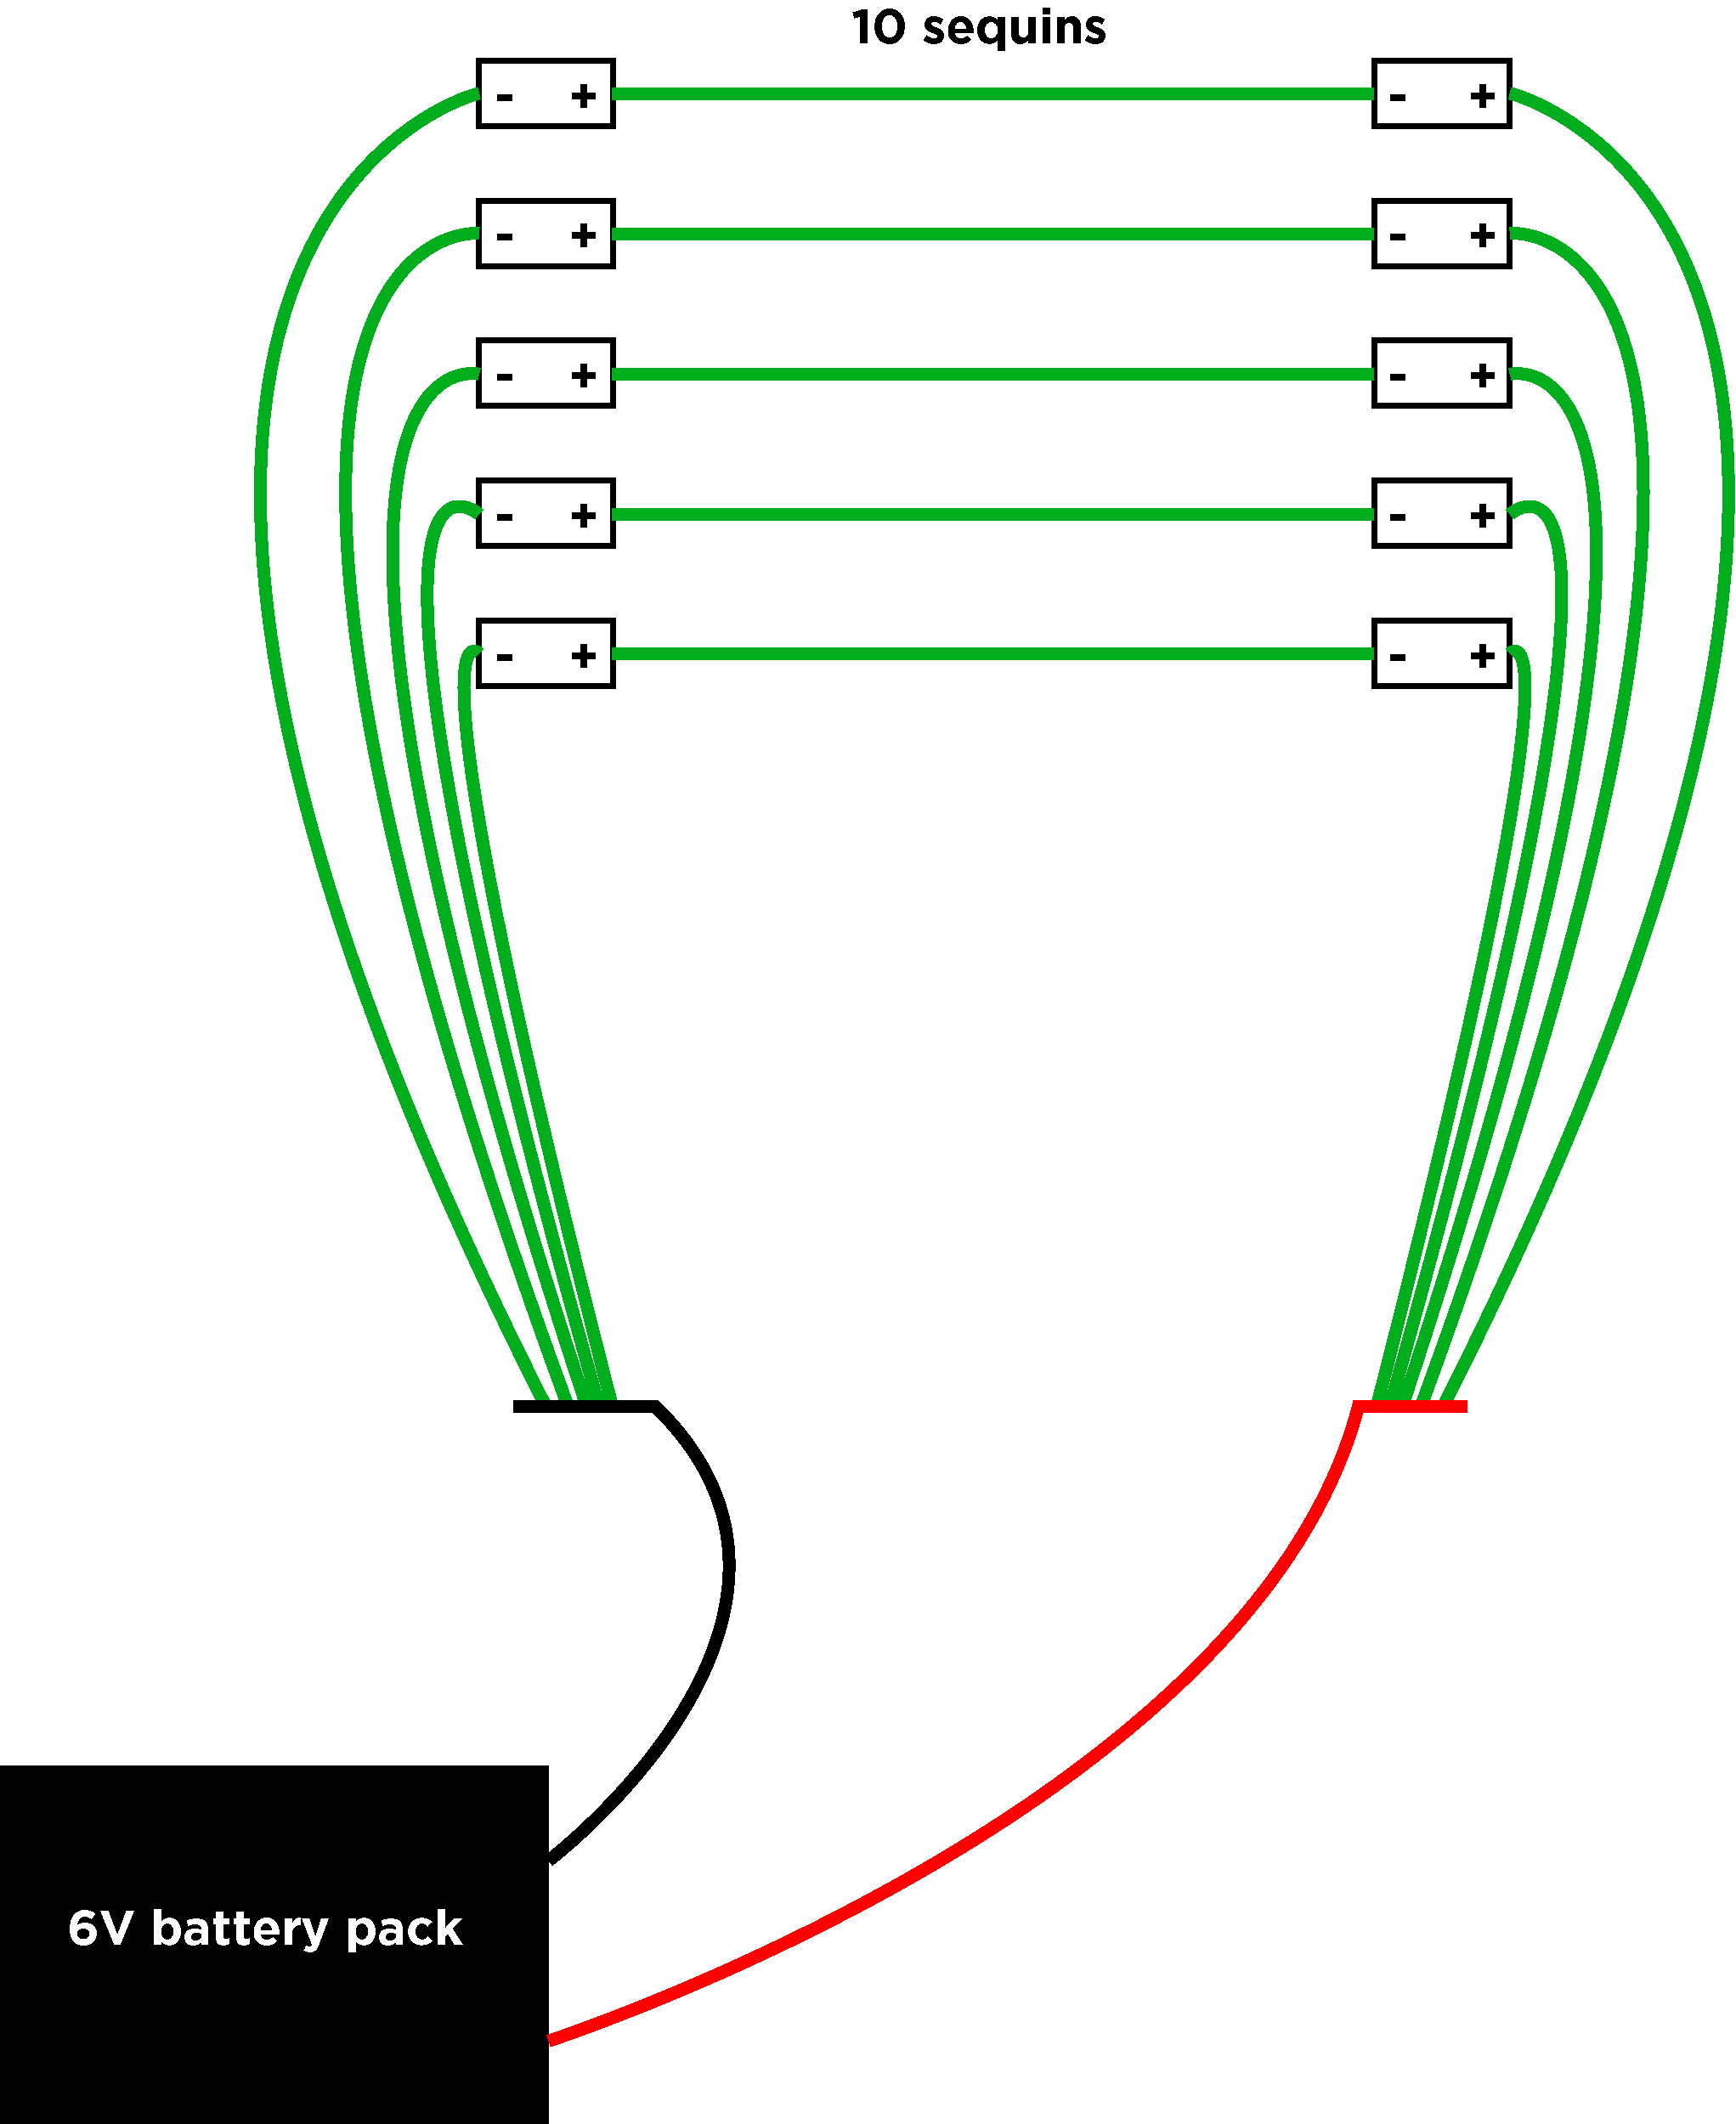 leds_diagram.png